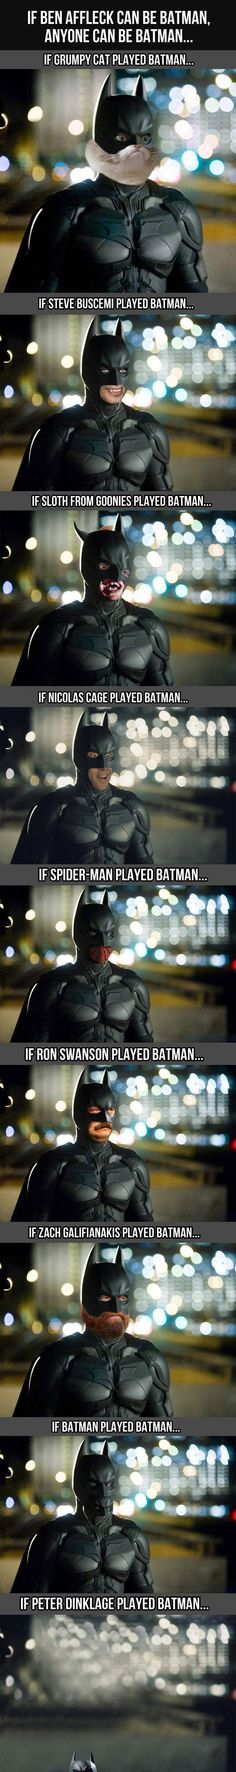 All the Batmans